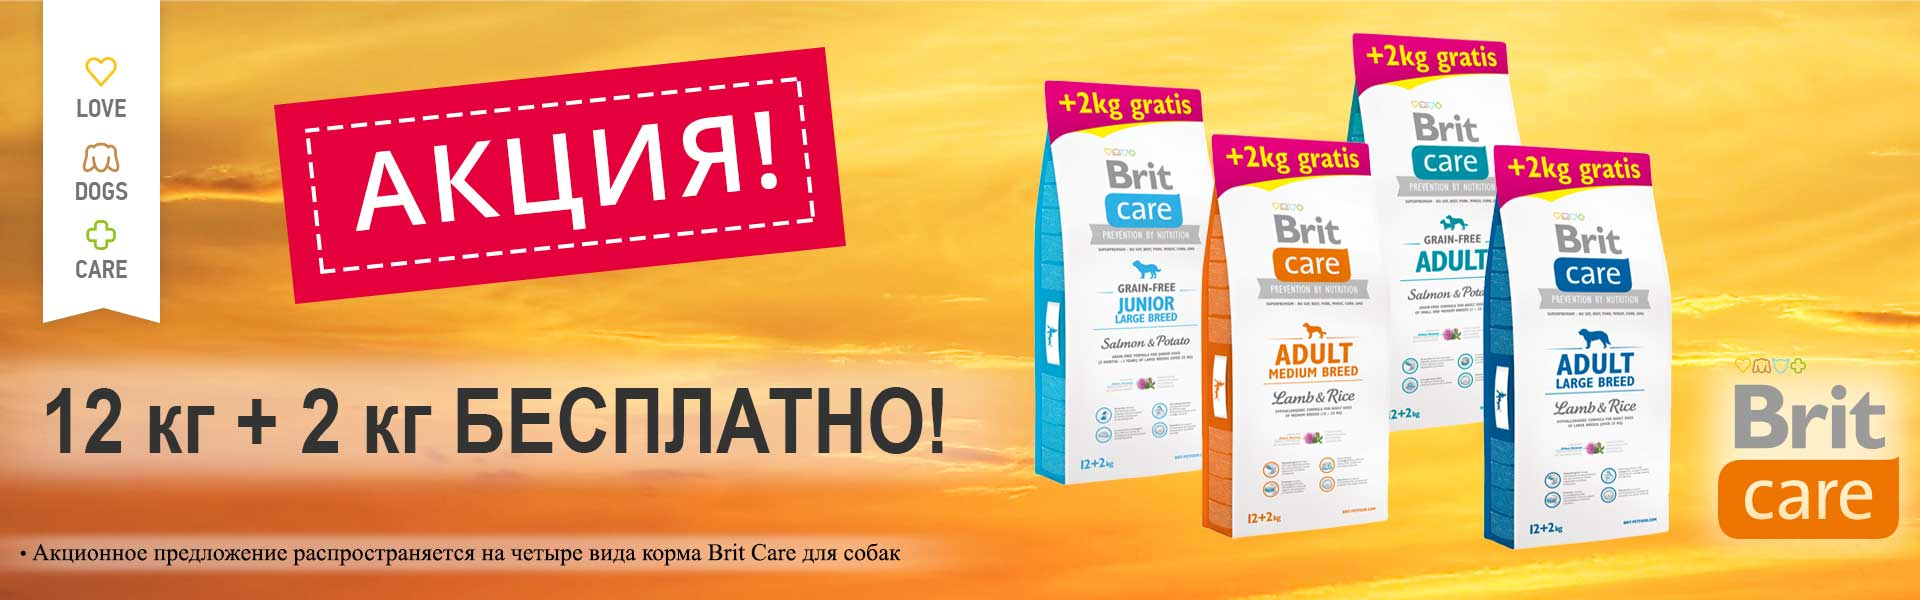 Brit Care 12+2 кг бесплатно